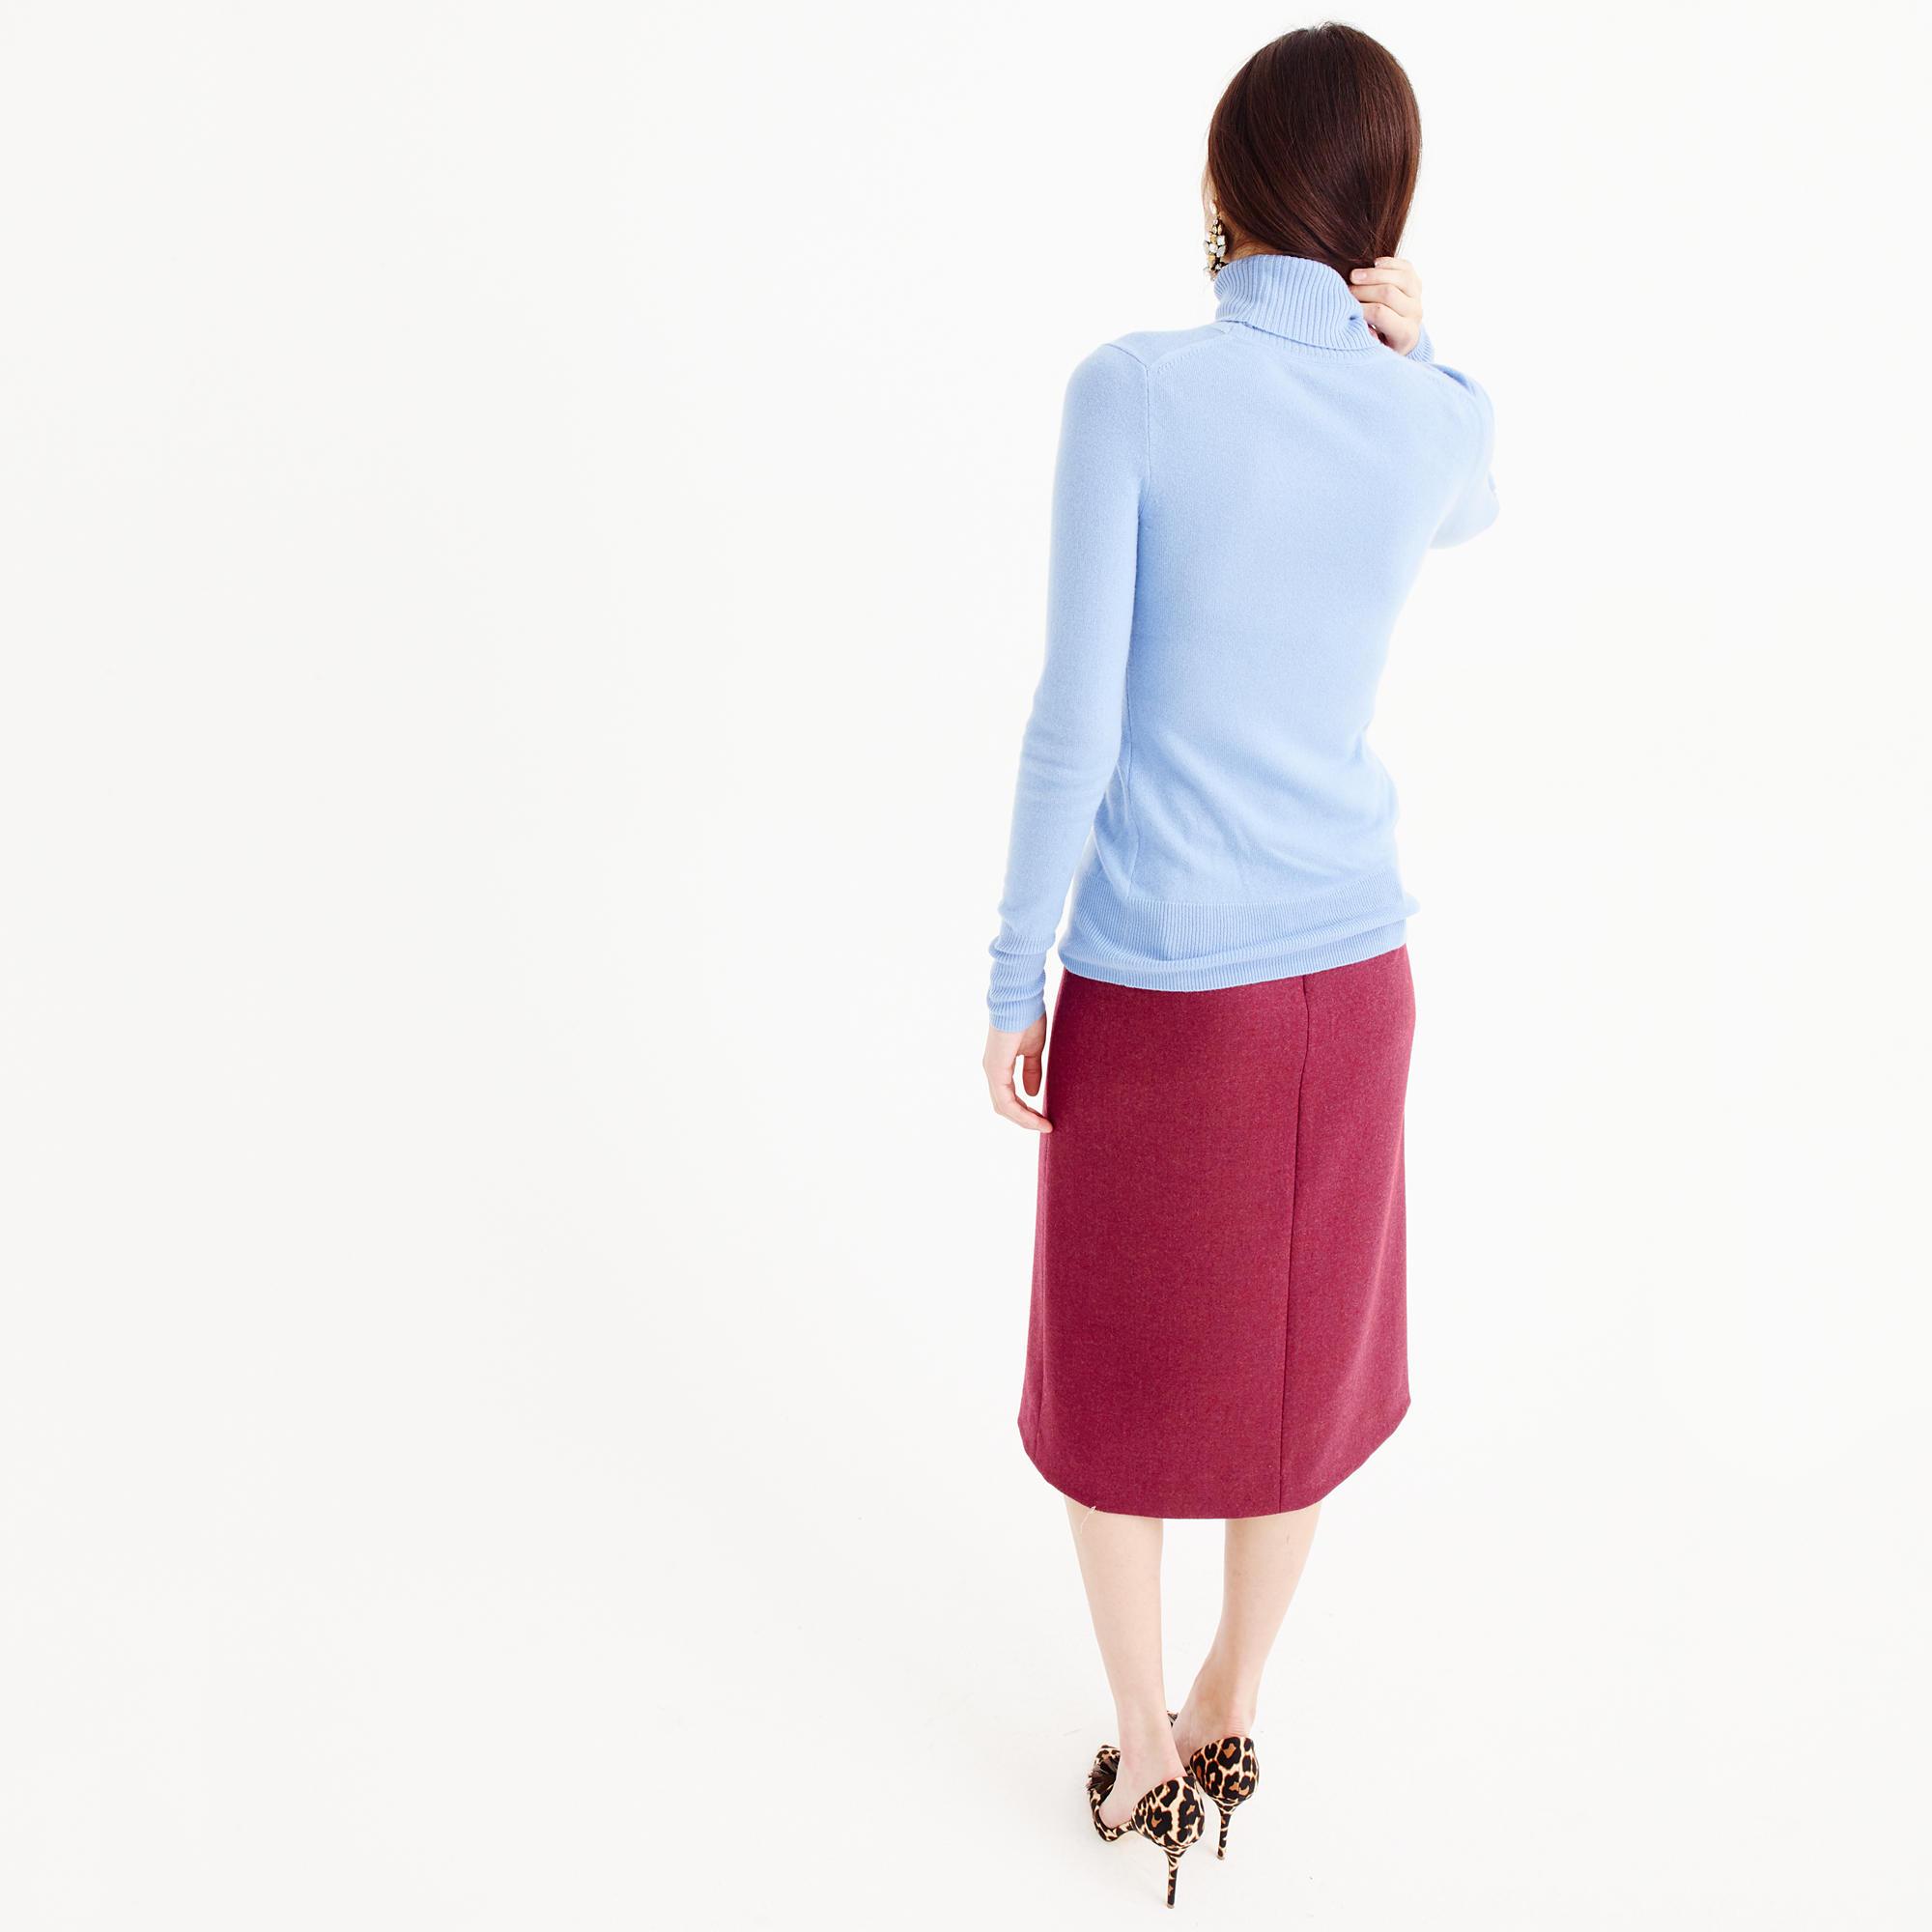 Petite A-line midi skirt in double-serge wool : Women skirts | J.Crew